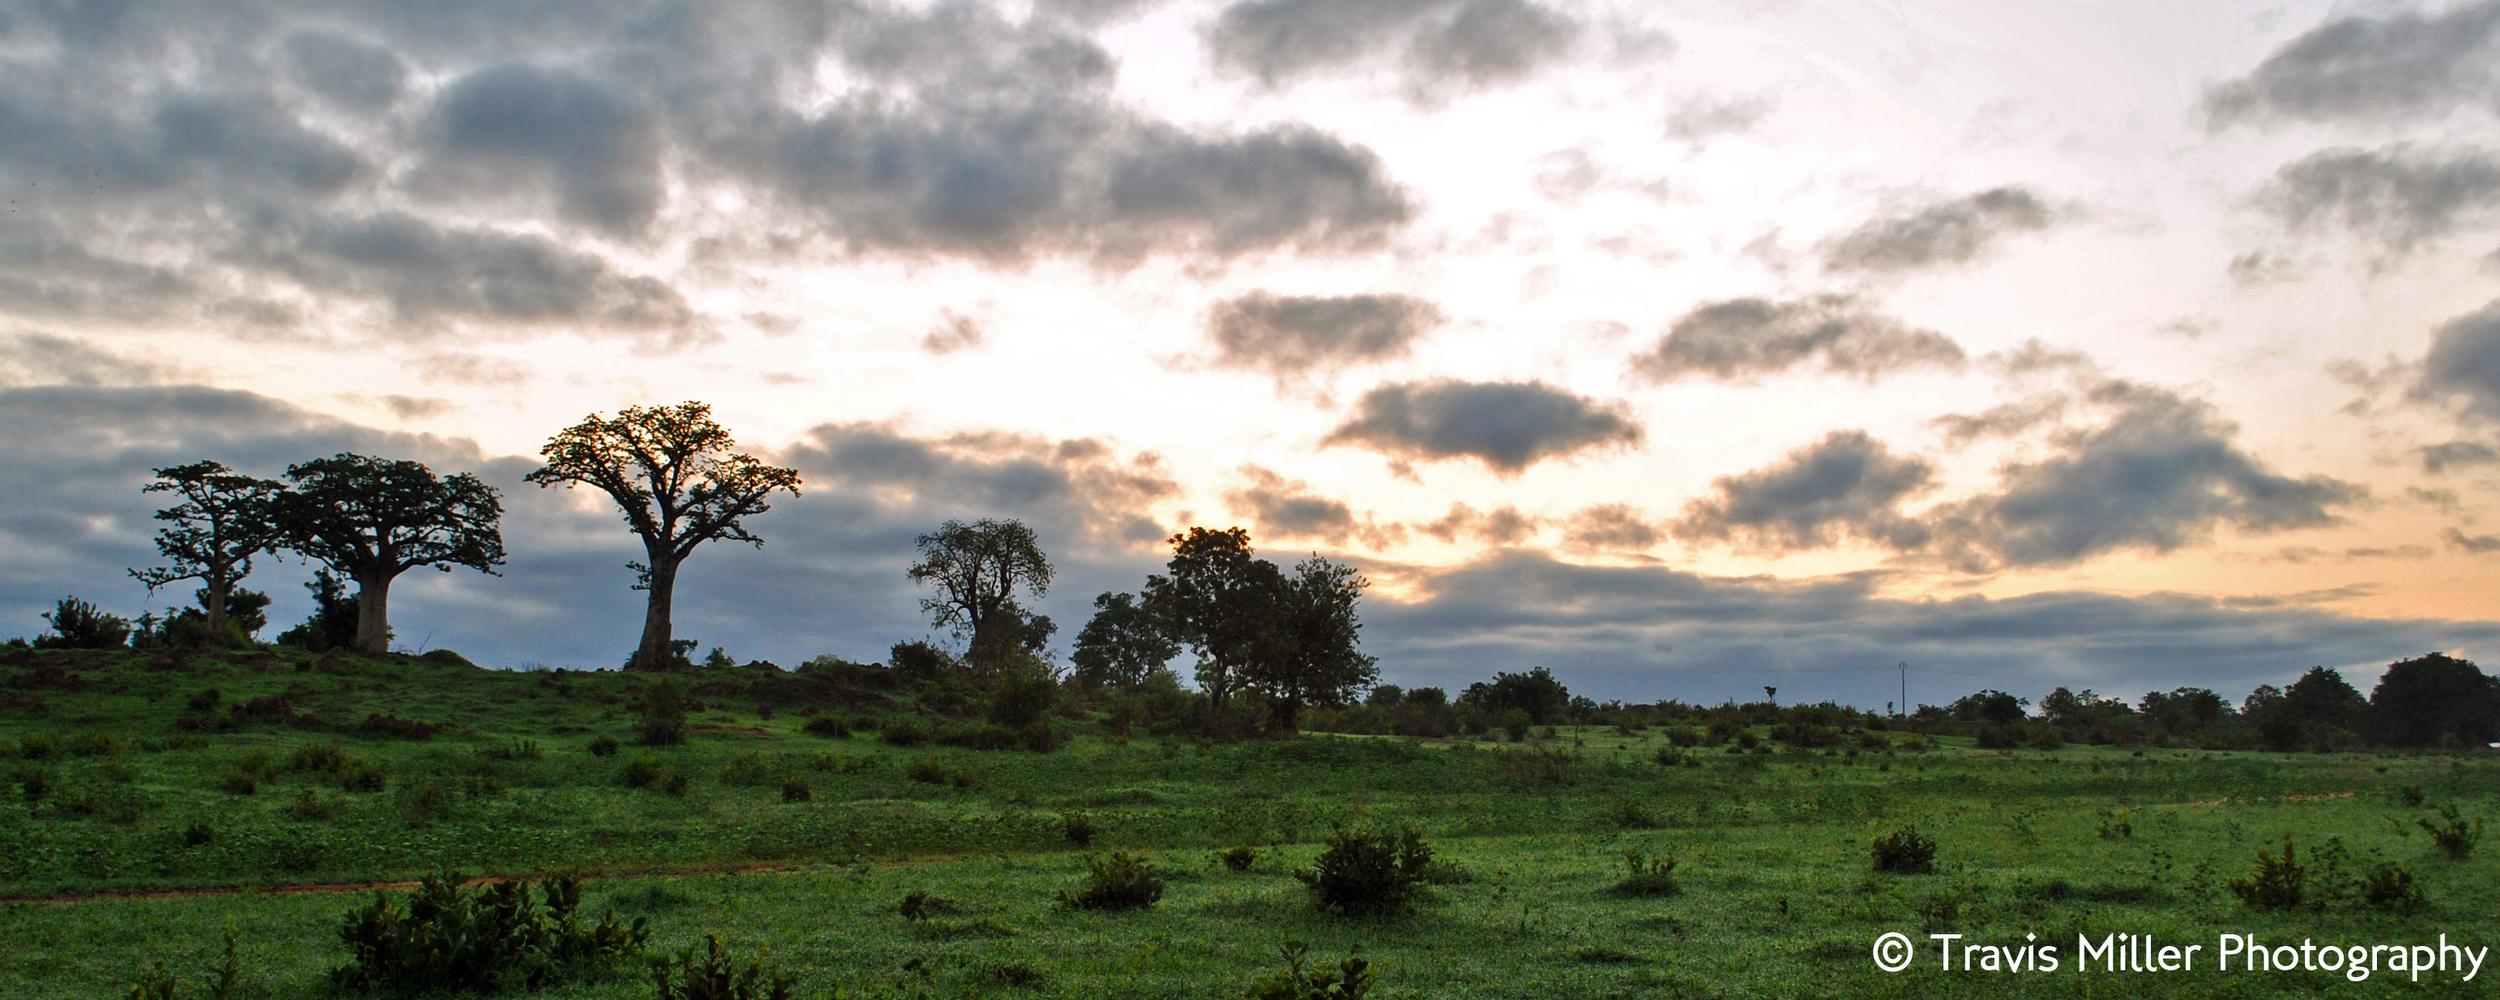 A Rainy Season Sunrise    Pakalinding, The Gambia